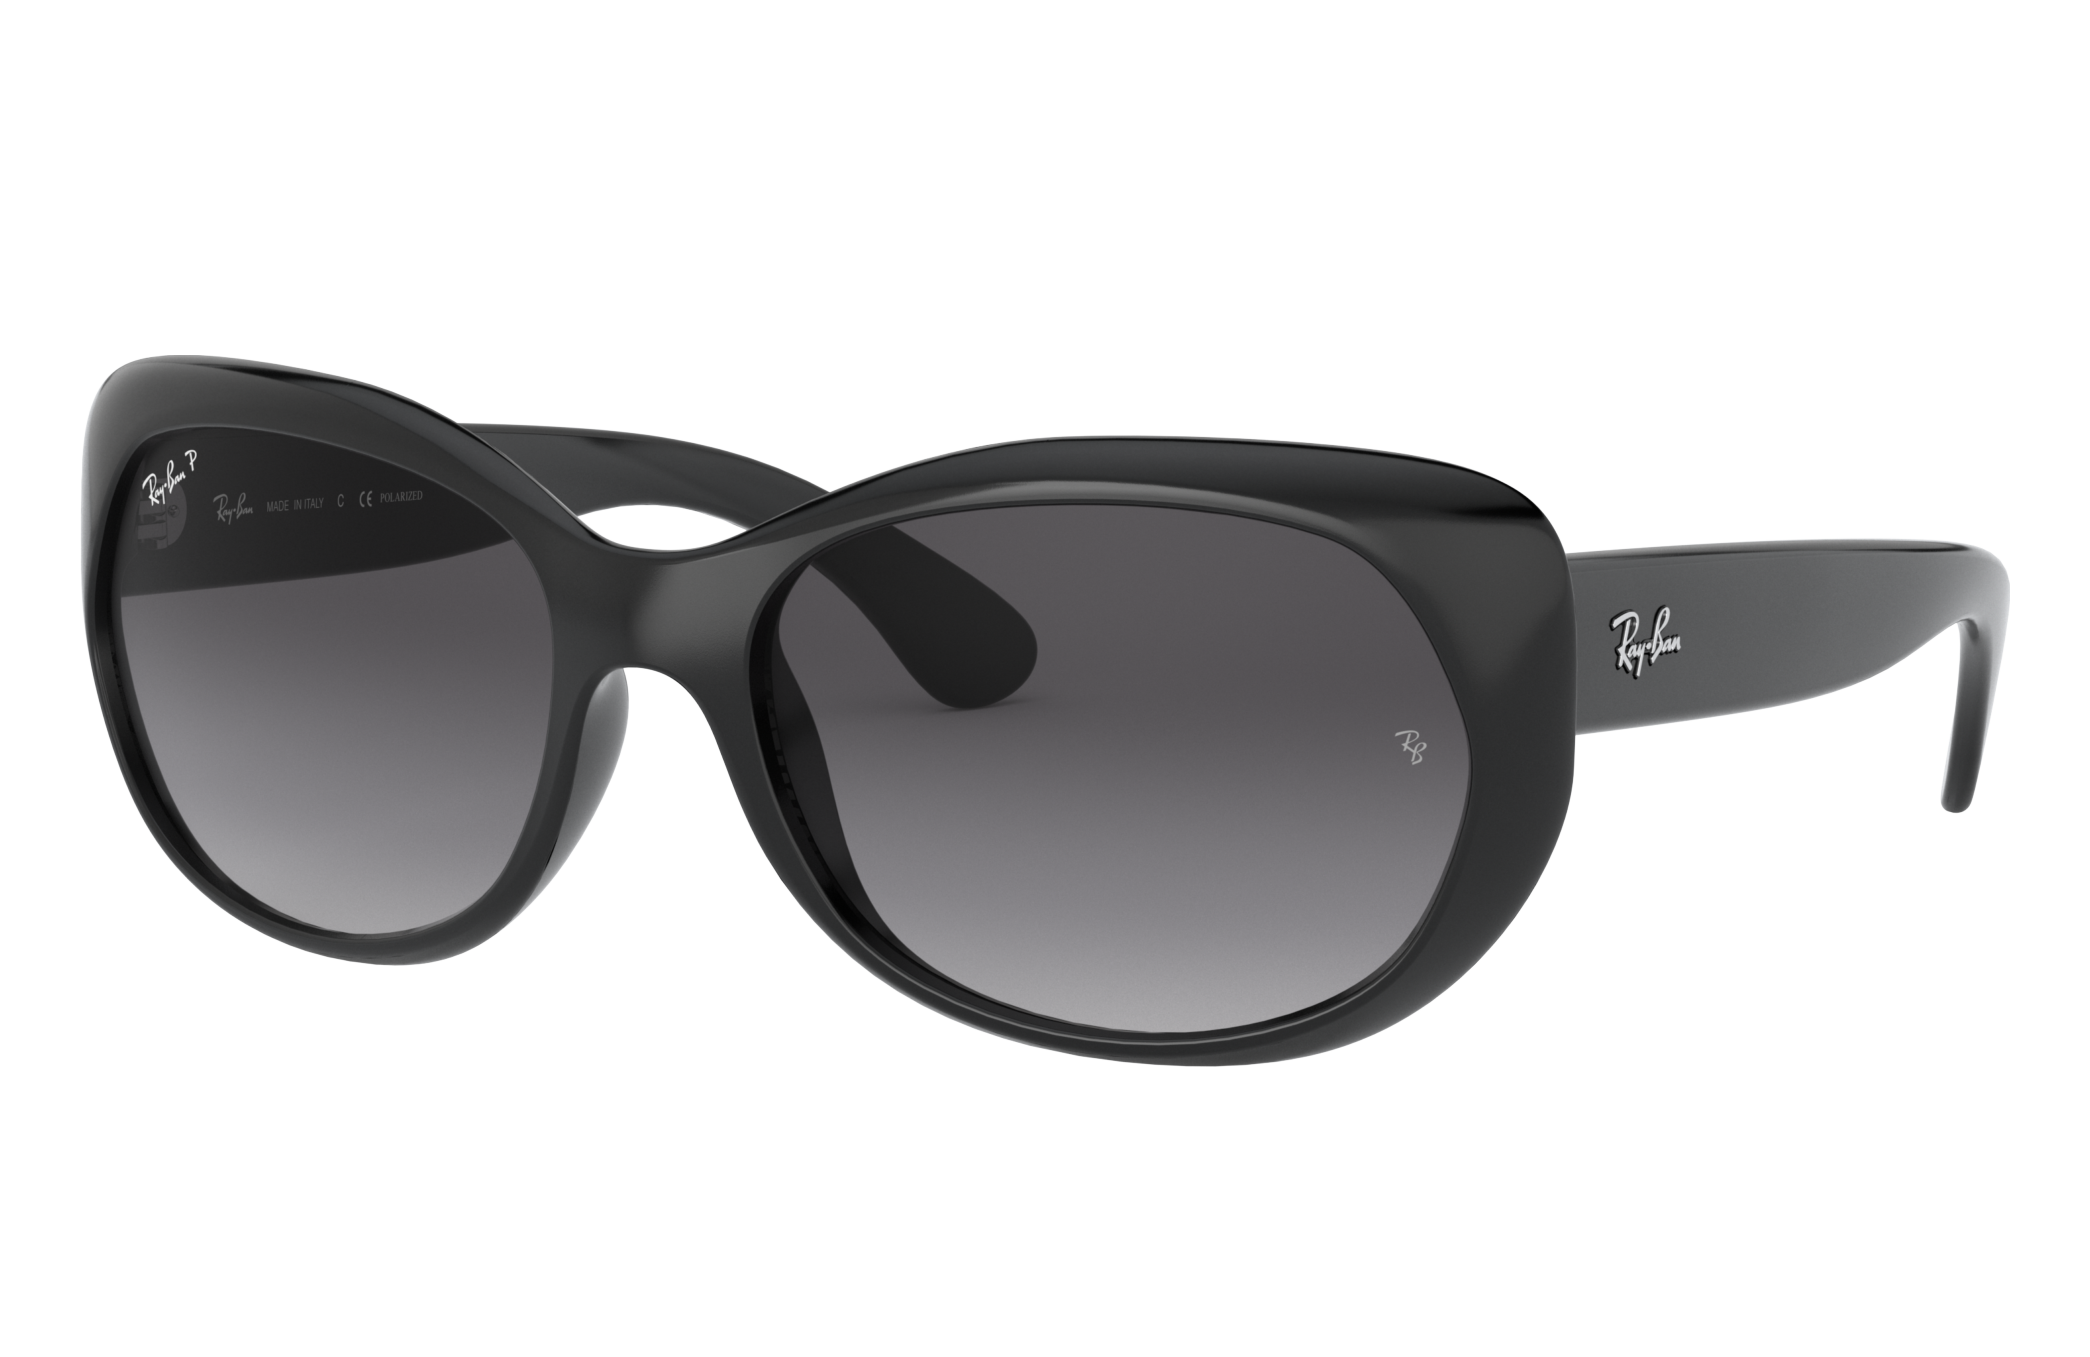 Ray-Ban Rb4325 Black, Polarized Grey Lenses - RB4325